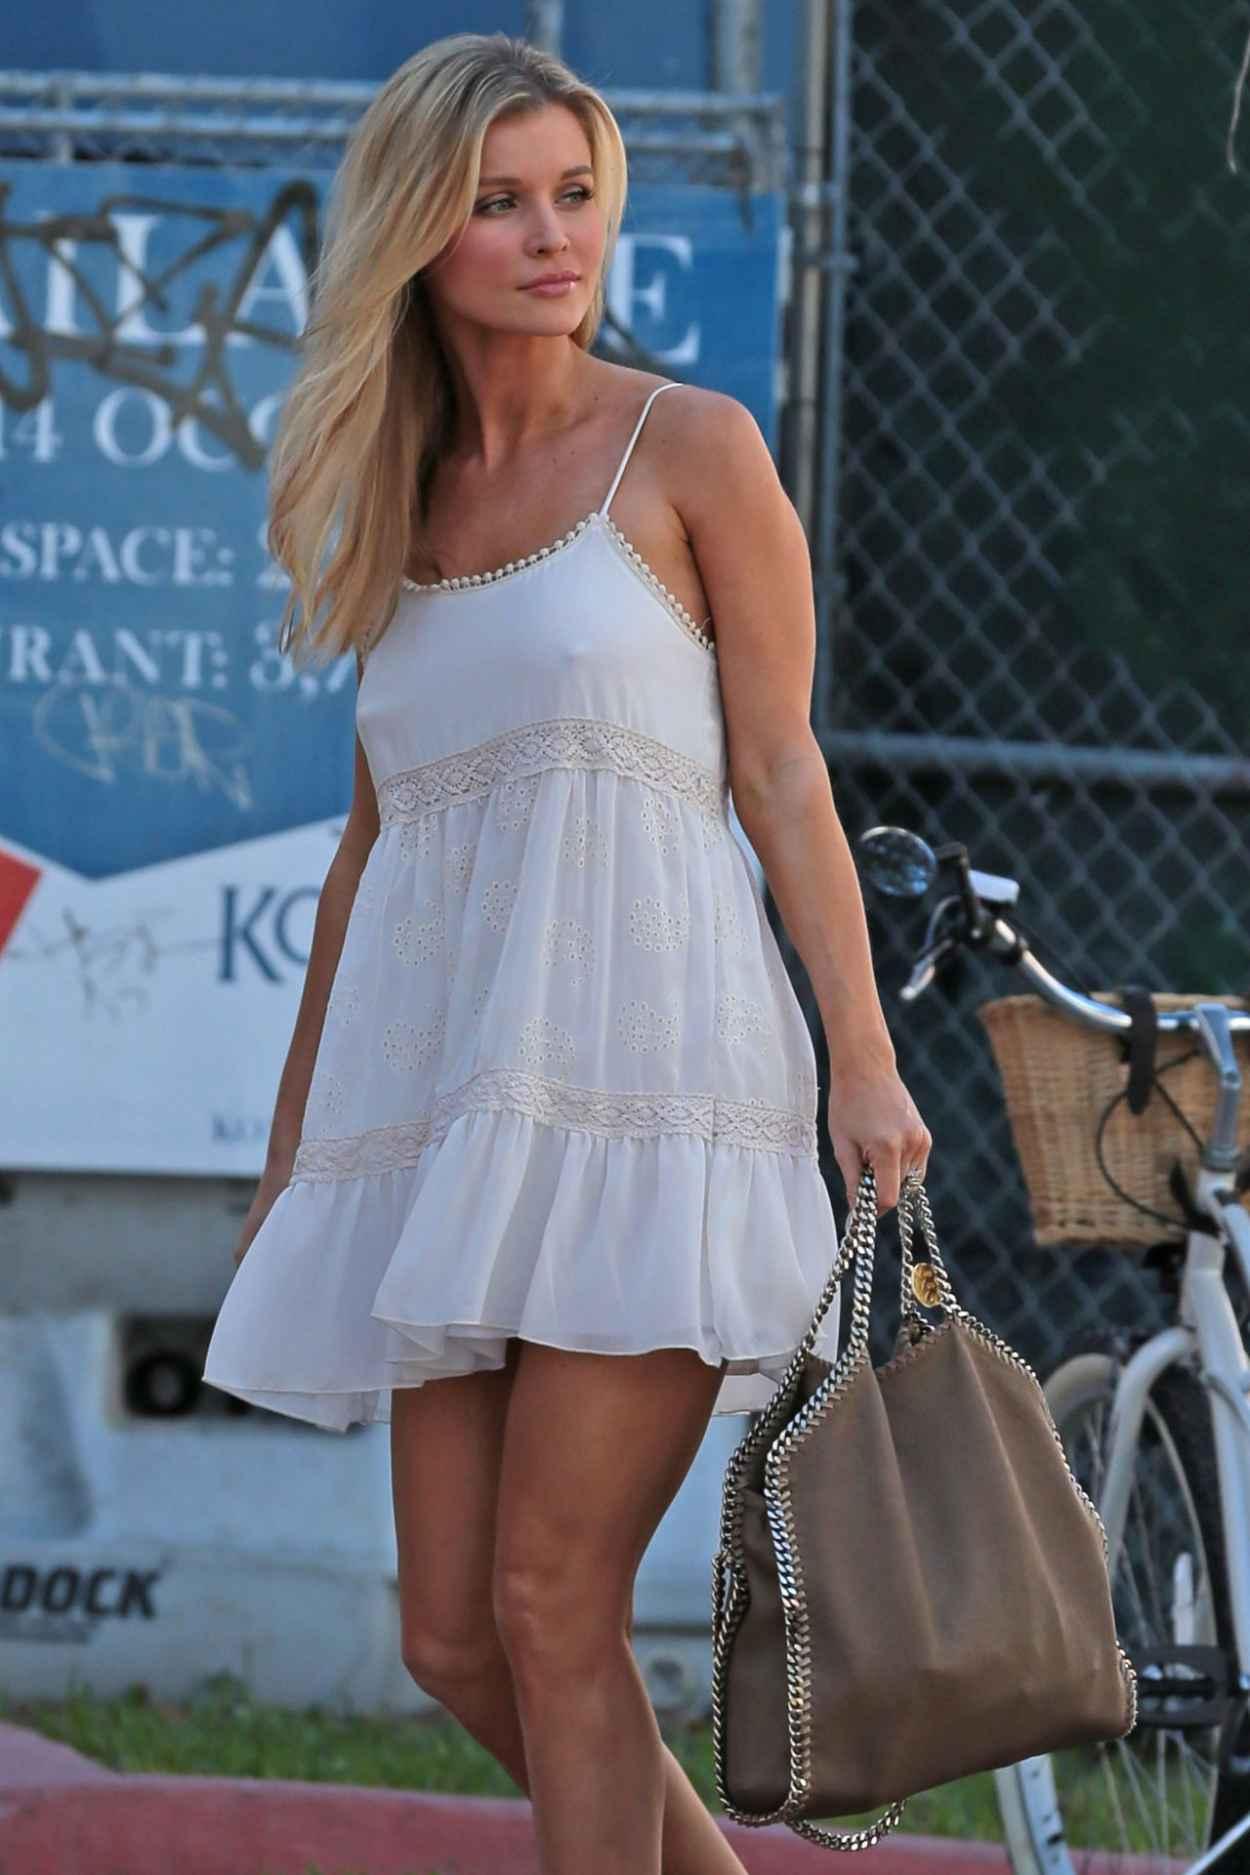 Joanna Krupa - in White Mini Dress Out in Miami, February 2015-1